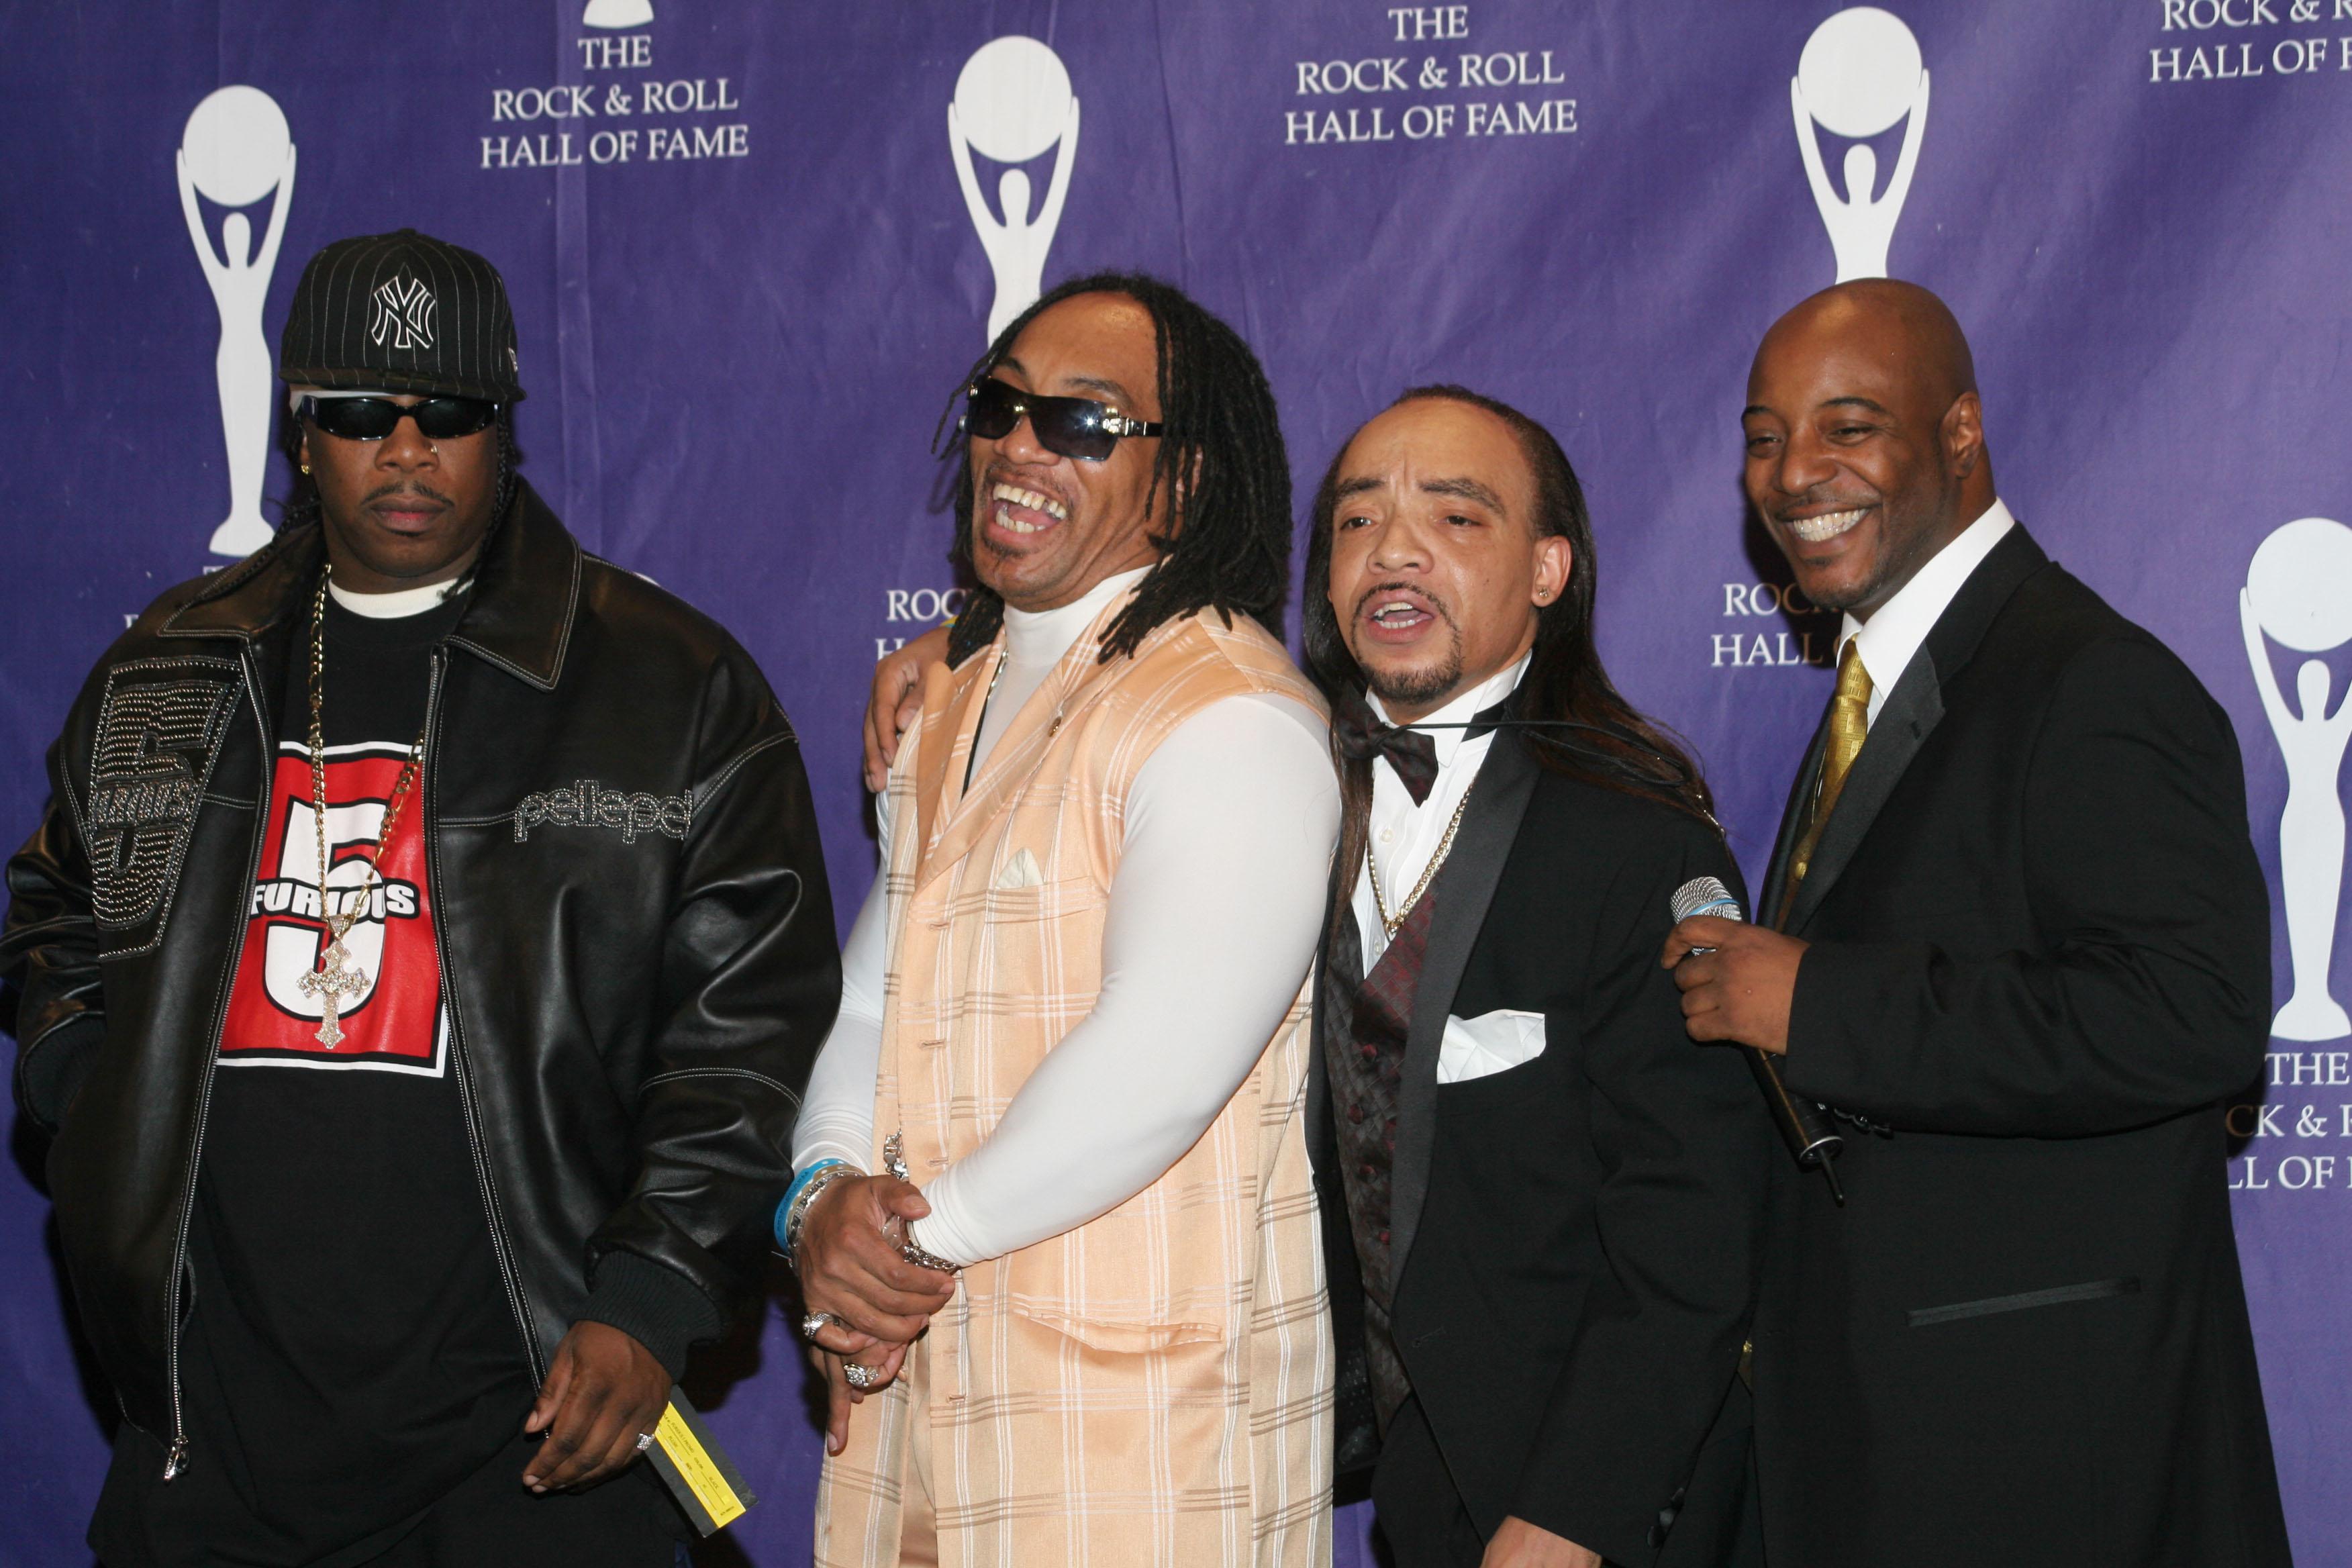 USA - 2007 Rock and Roll Hall of Fame - Press Room